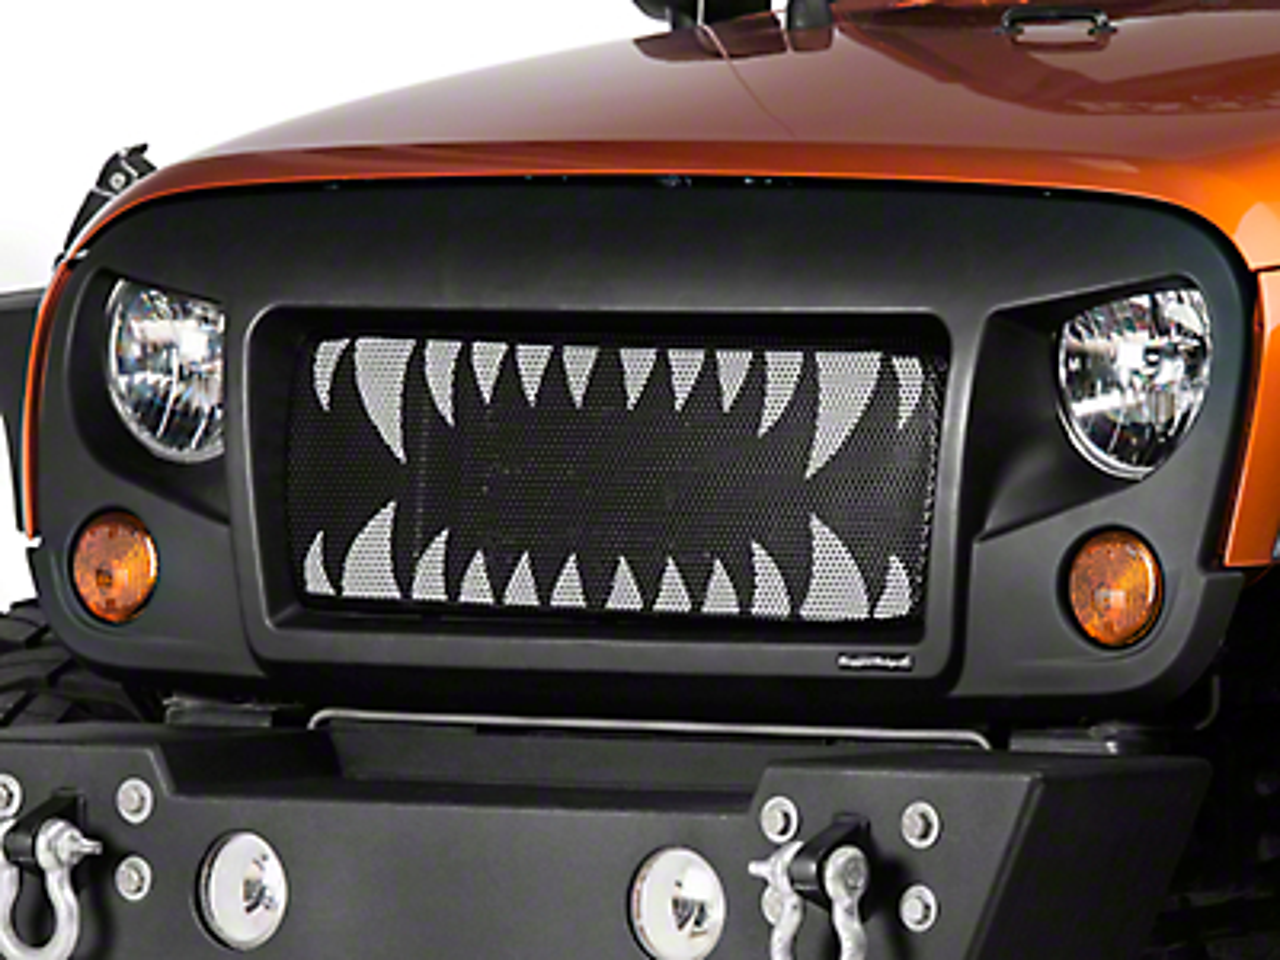 Rugged Ridge Spartan Grille Insert - Land Shark (07-18 Jeep Wrangler JK)